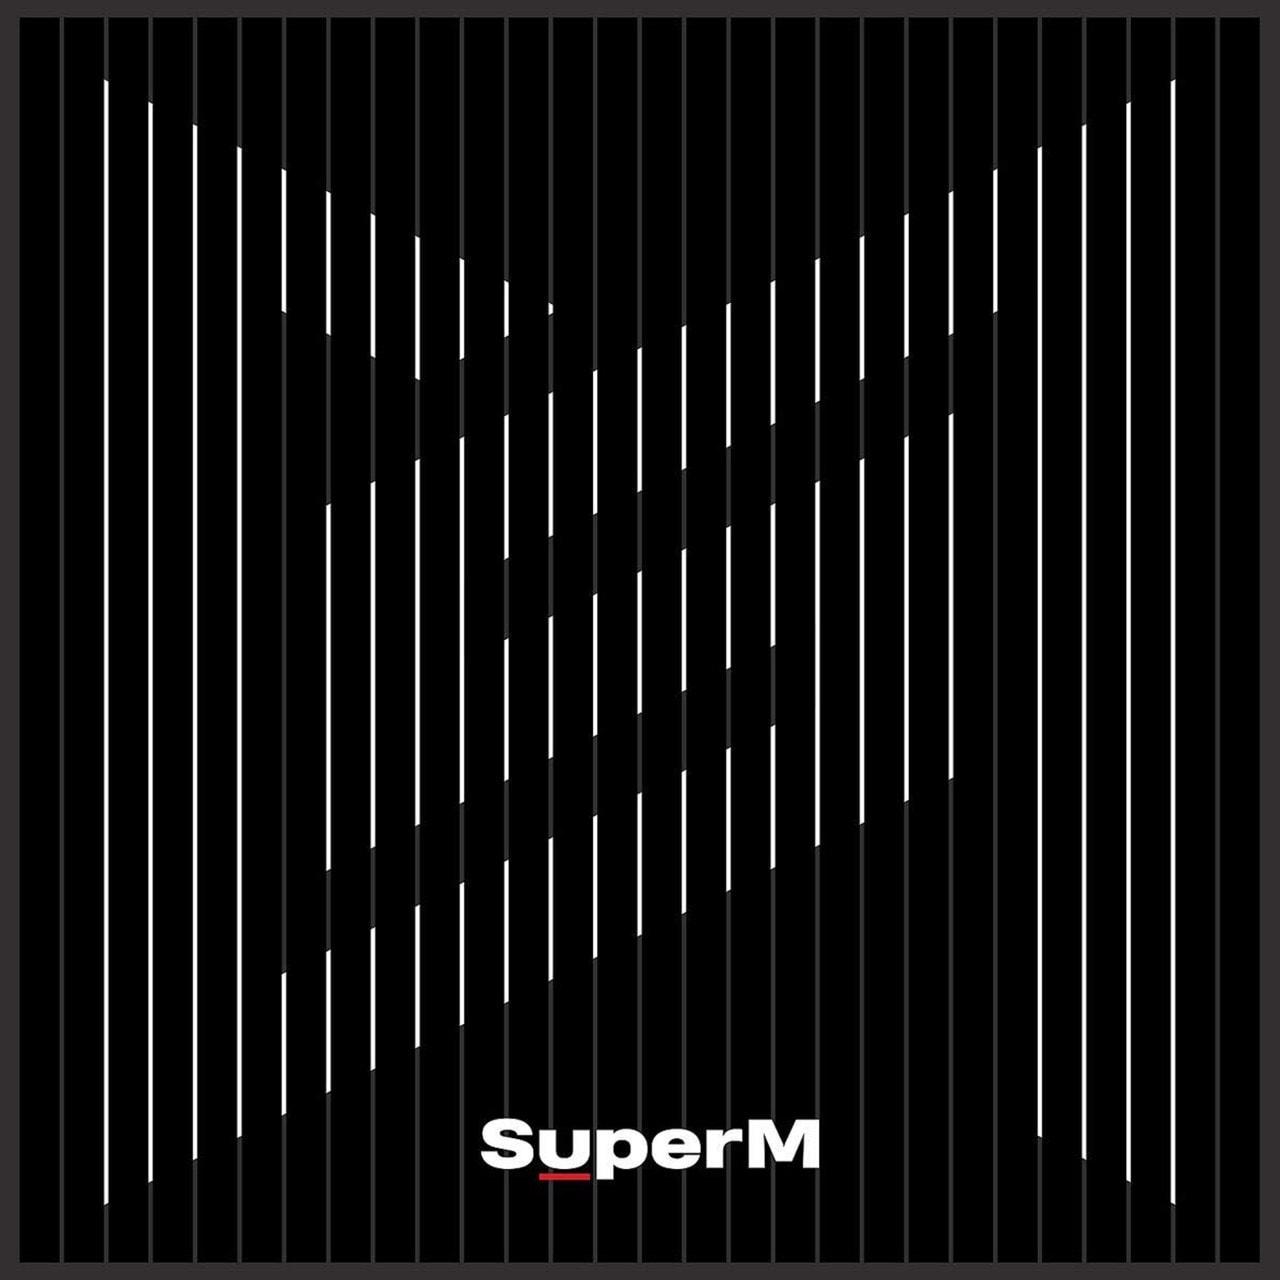 SuperM - The First Mini Album (United Version) - 1